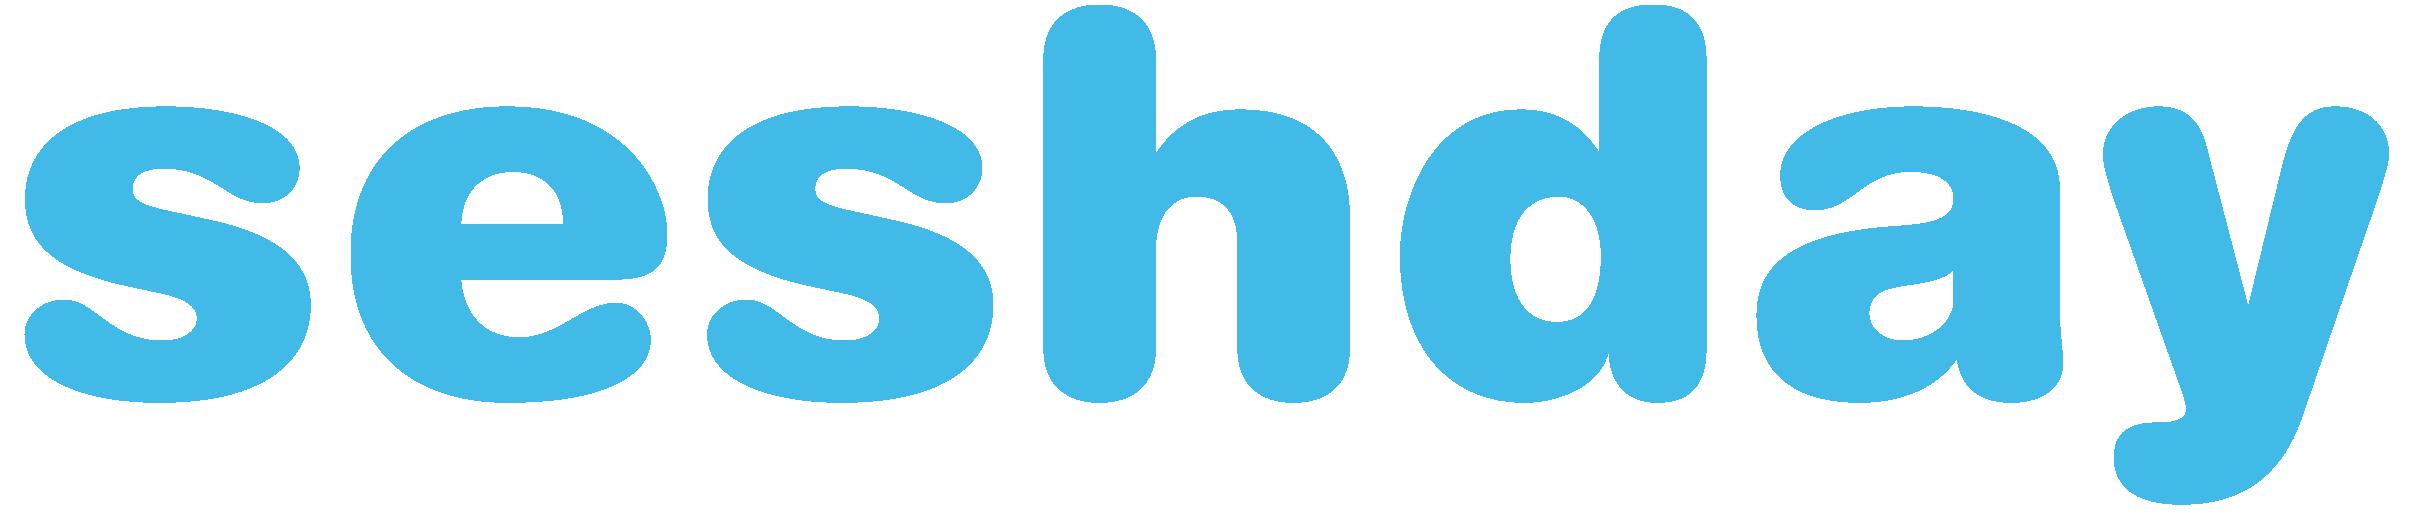 seshday-logo-01.png